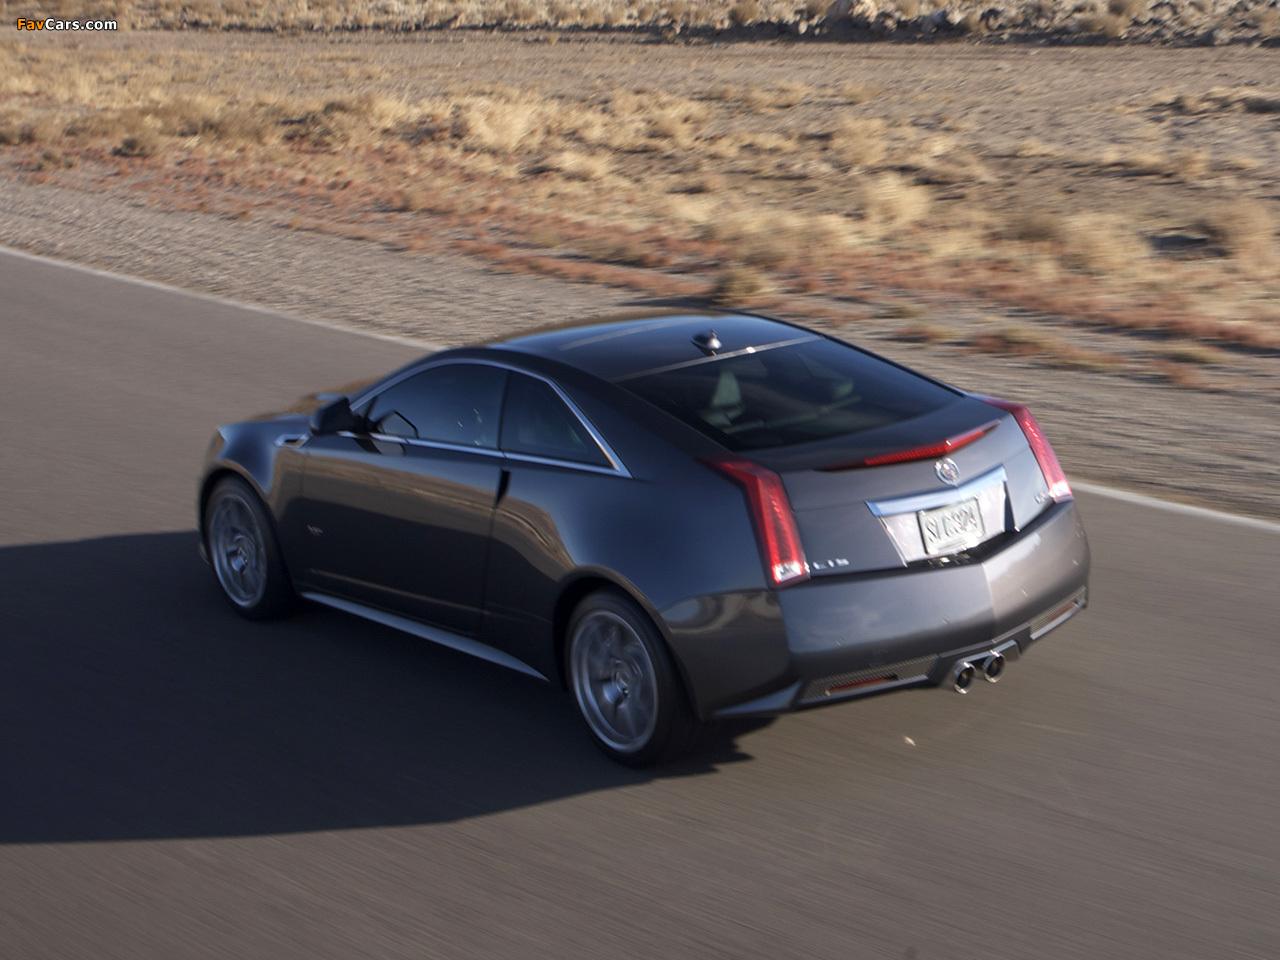 Cadillac CTS-V Coupe 2010 photos (1280 x 960)